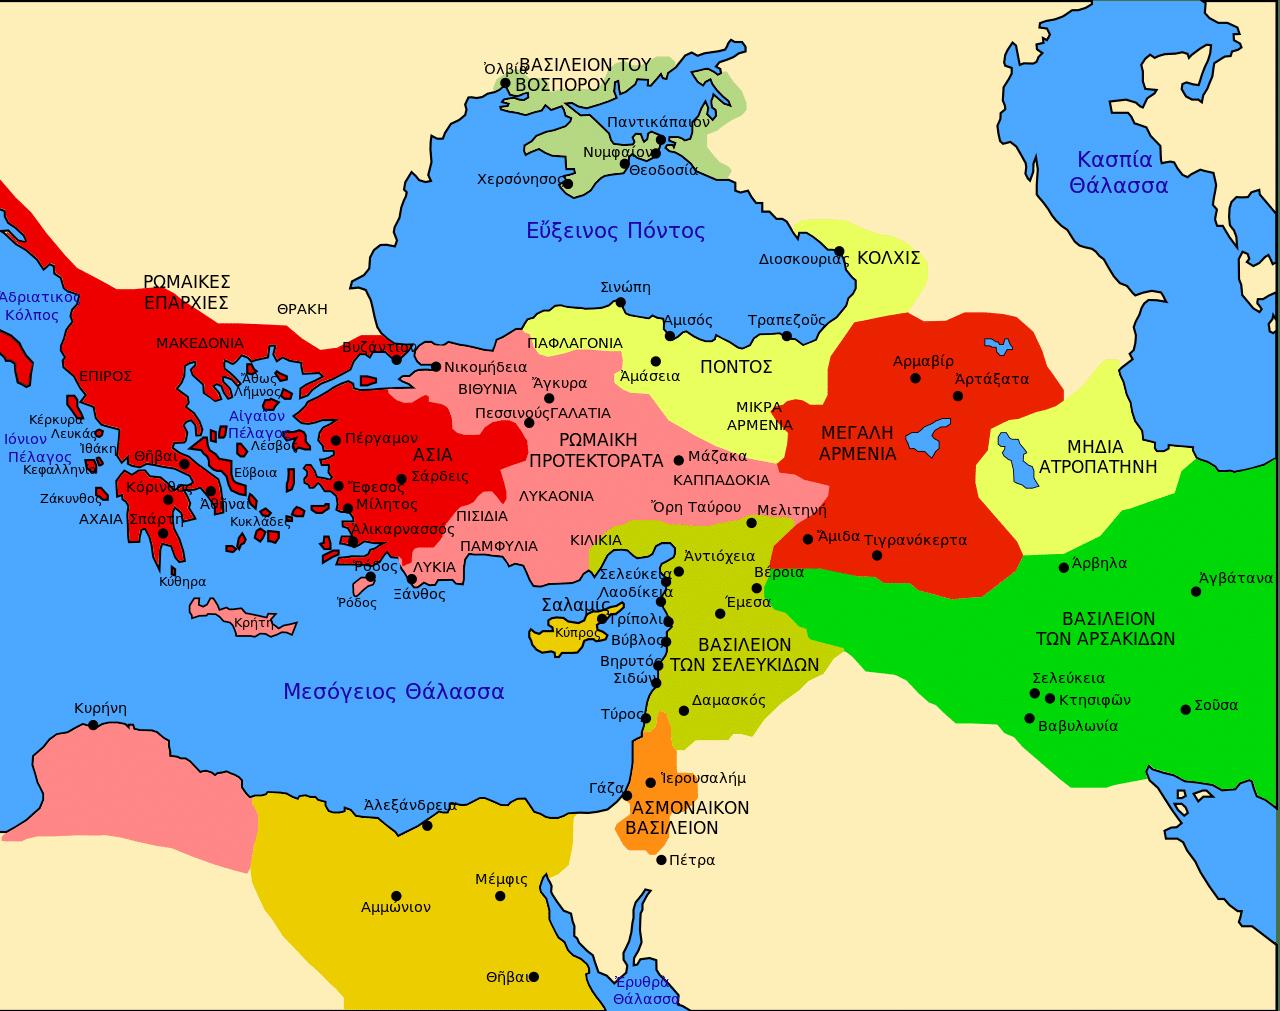 Mapa de la antigua Grecia